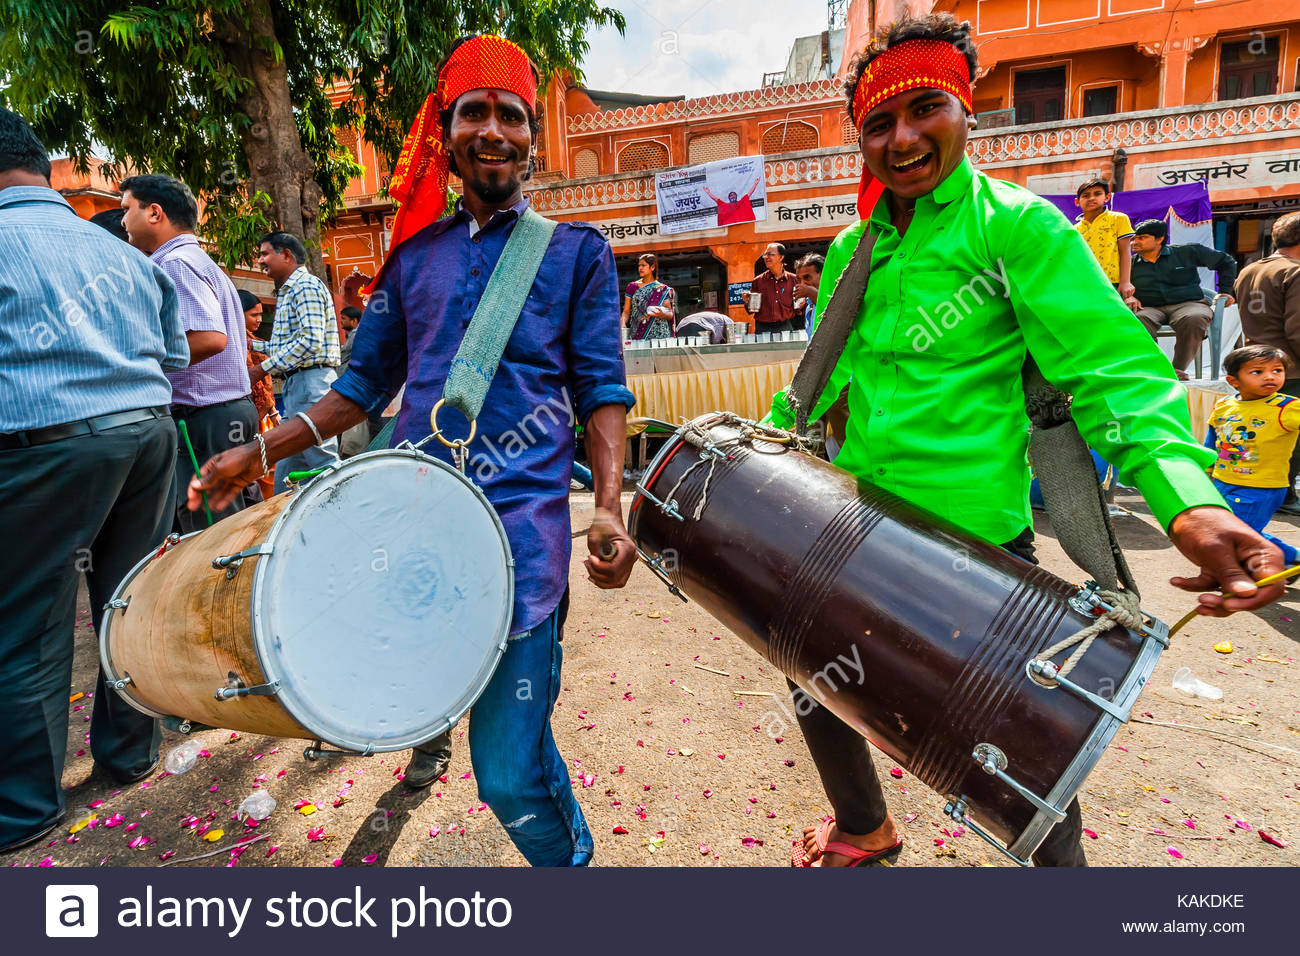 Un hindou local festval, Jaipur, Rajasthan, Inde. Photo Stock